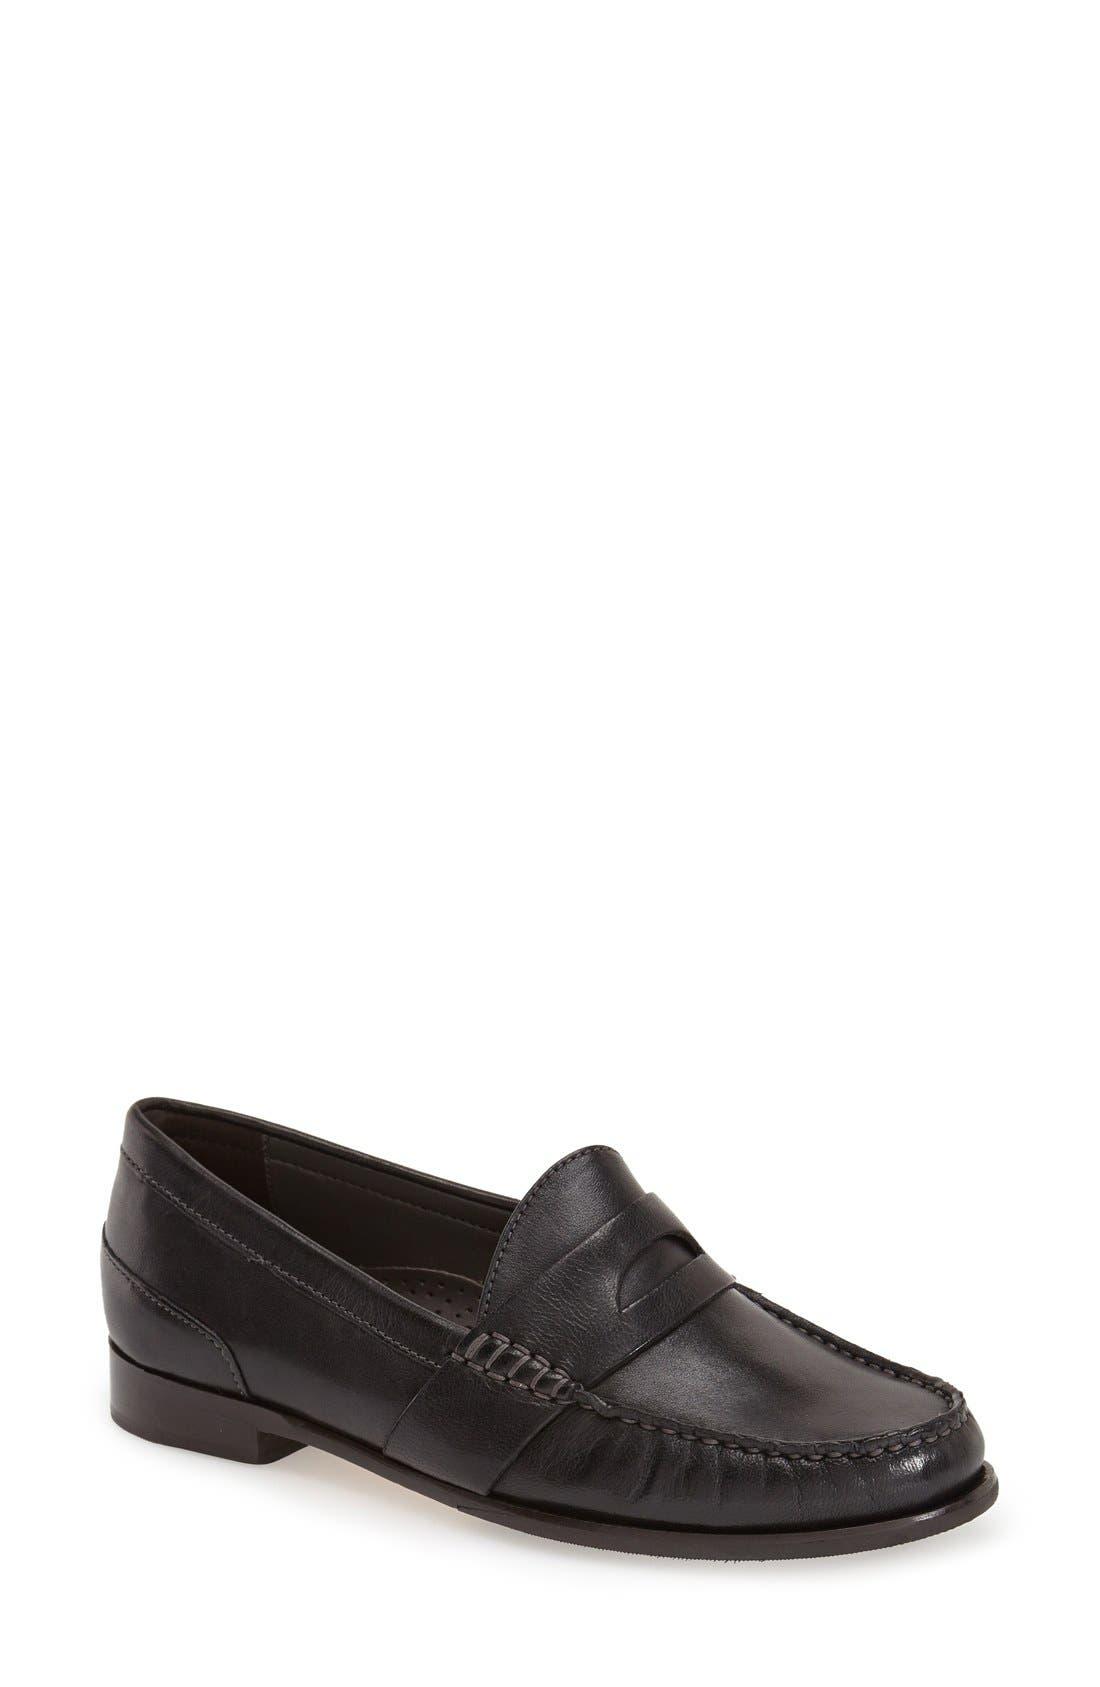 'Laurel' Moc Loafer,                             Main thumbnail 1, color,                             Black Leather